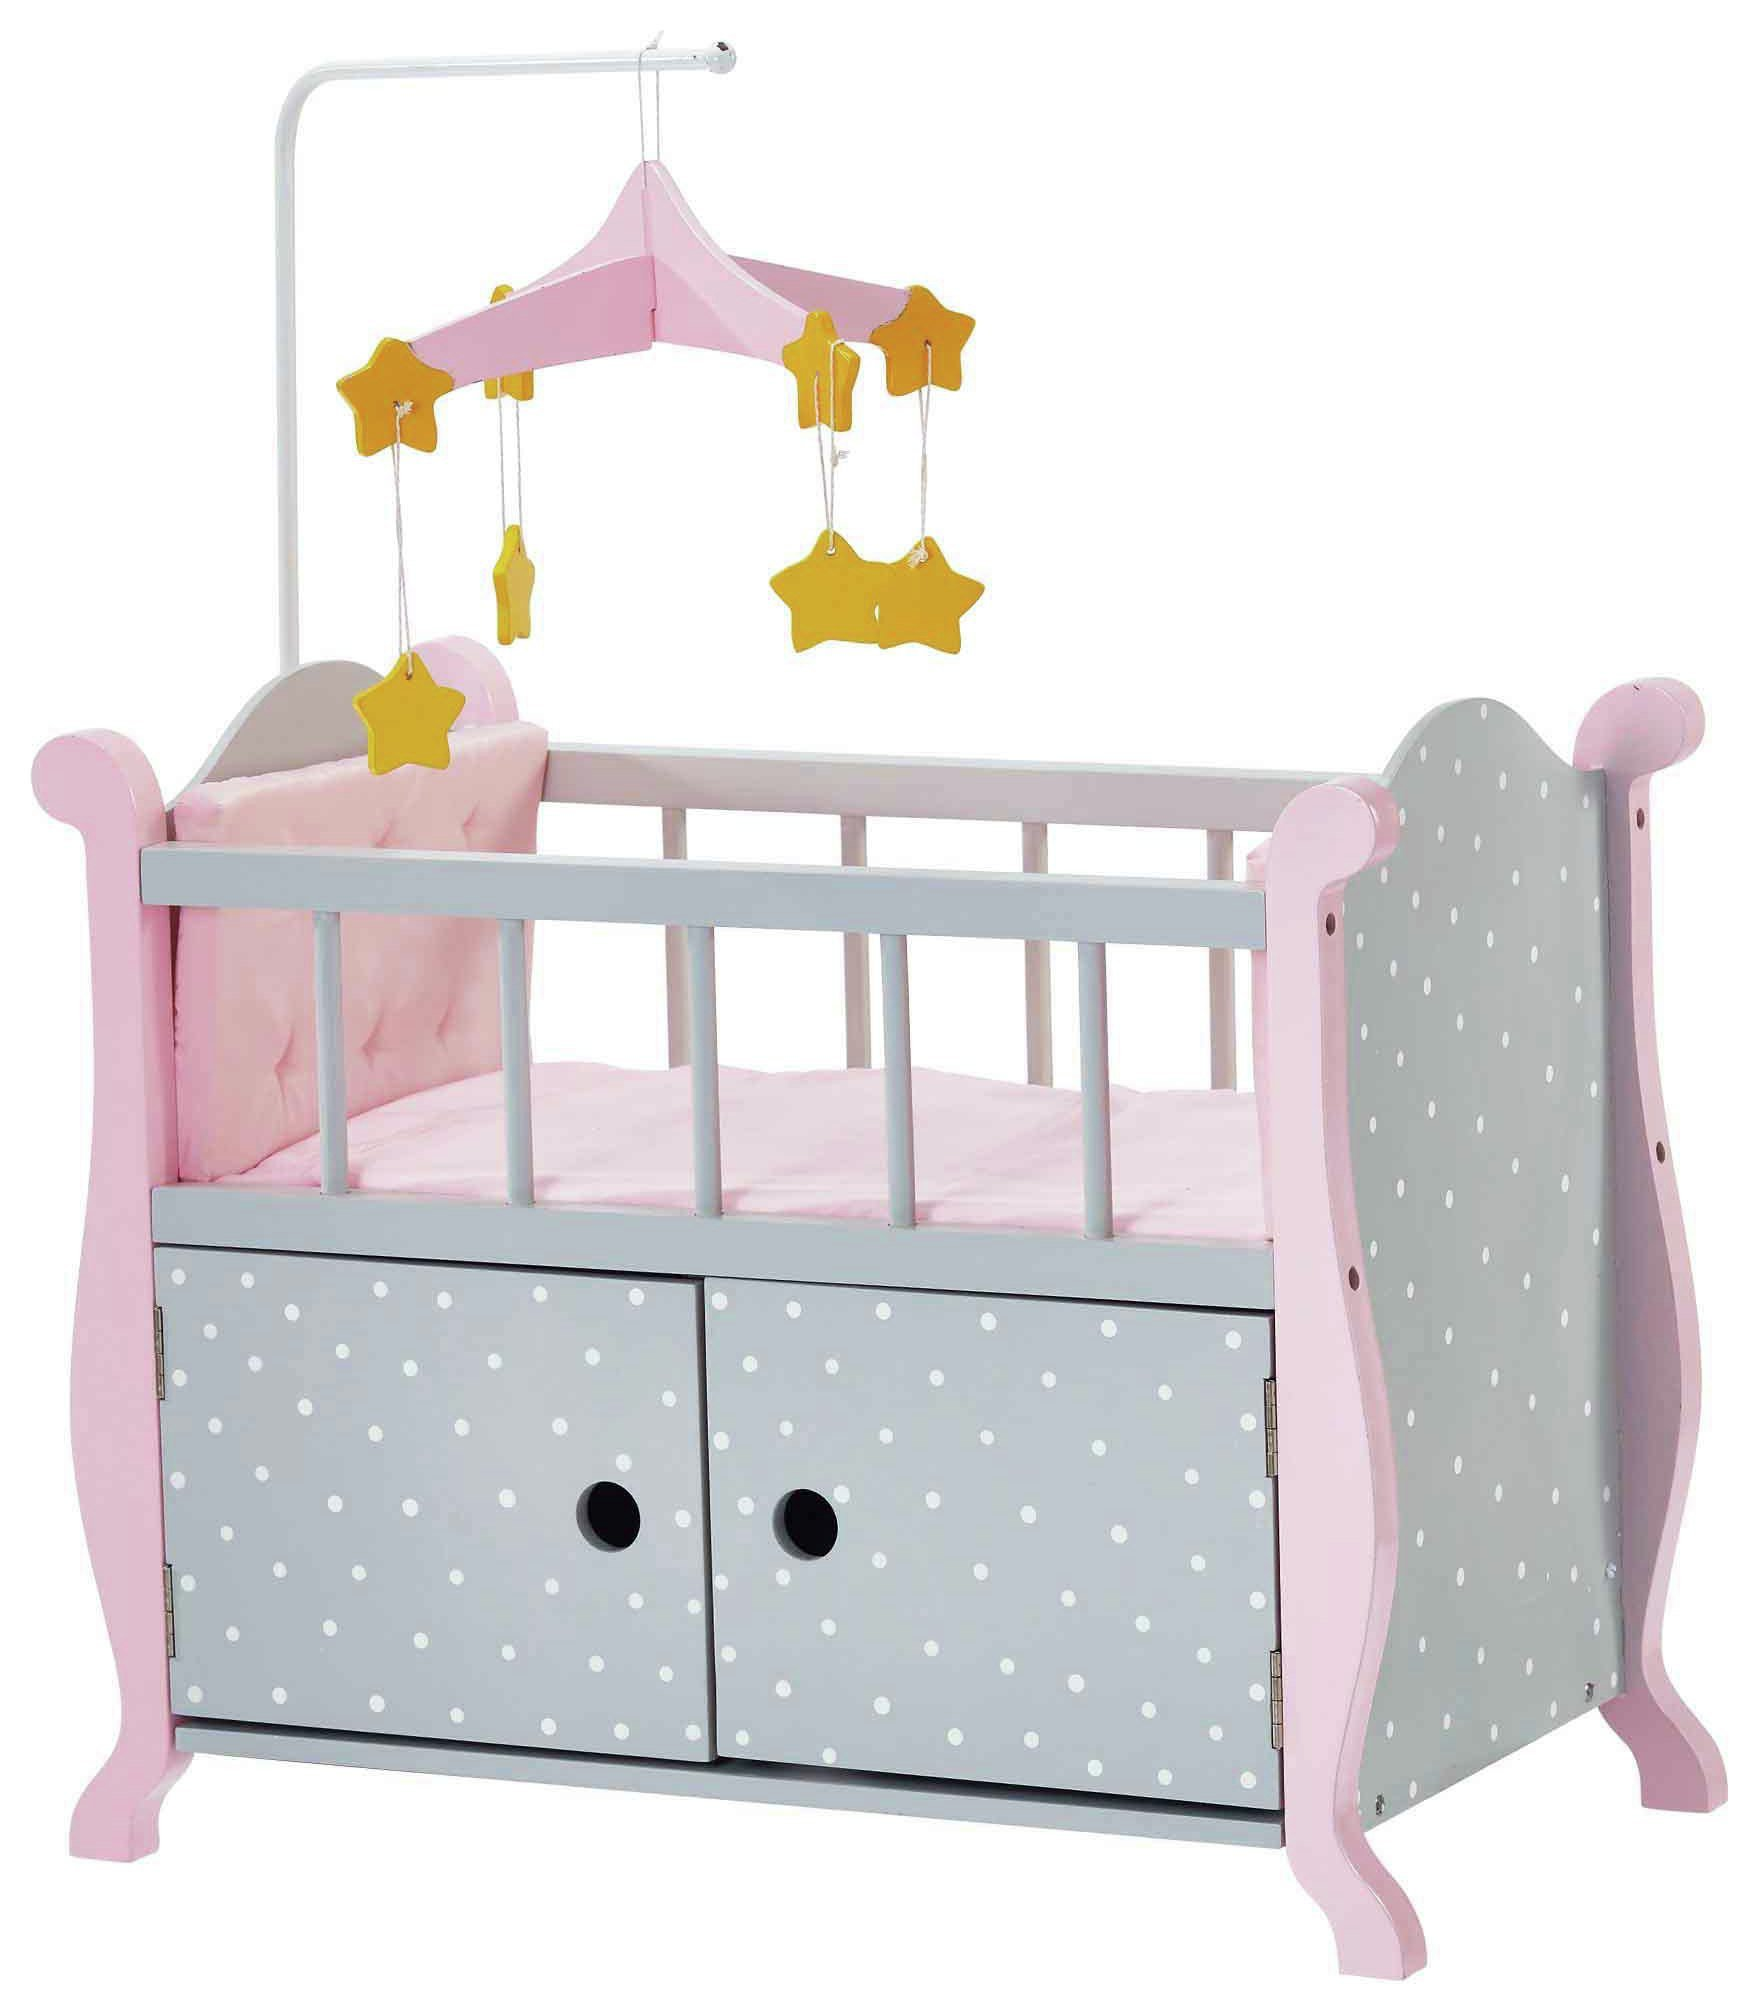 Image of Olivia's Little World Polka Dots Doll Furniture Nursery Bed.